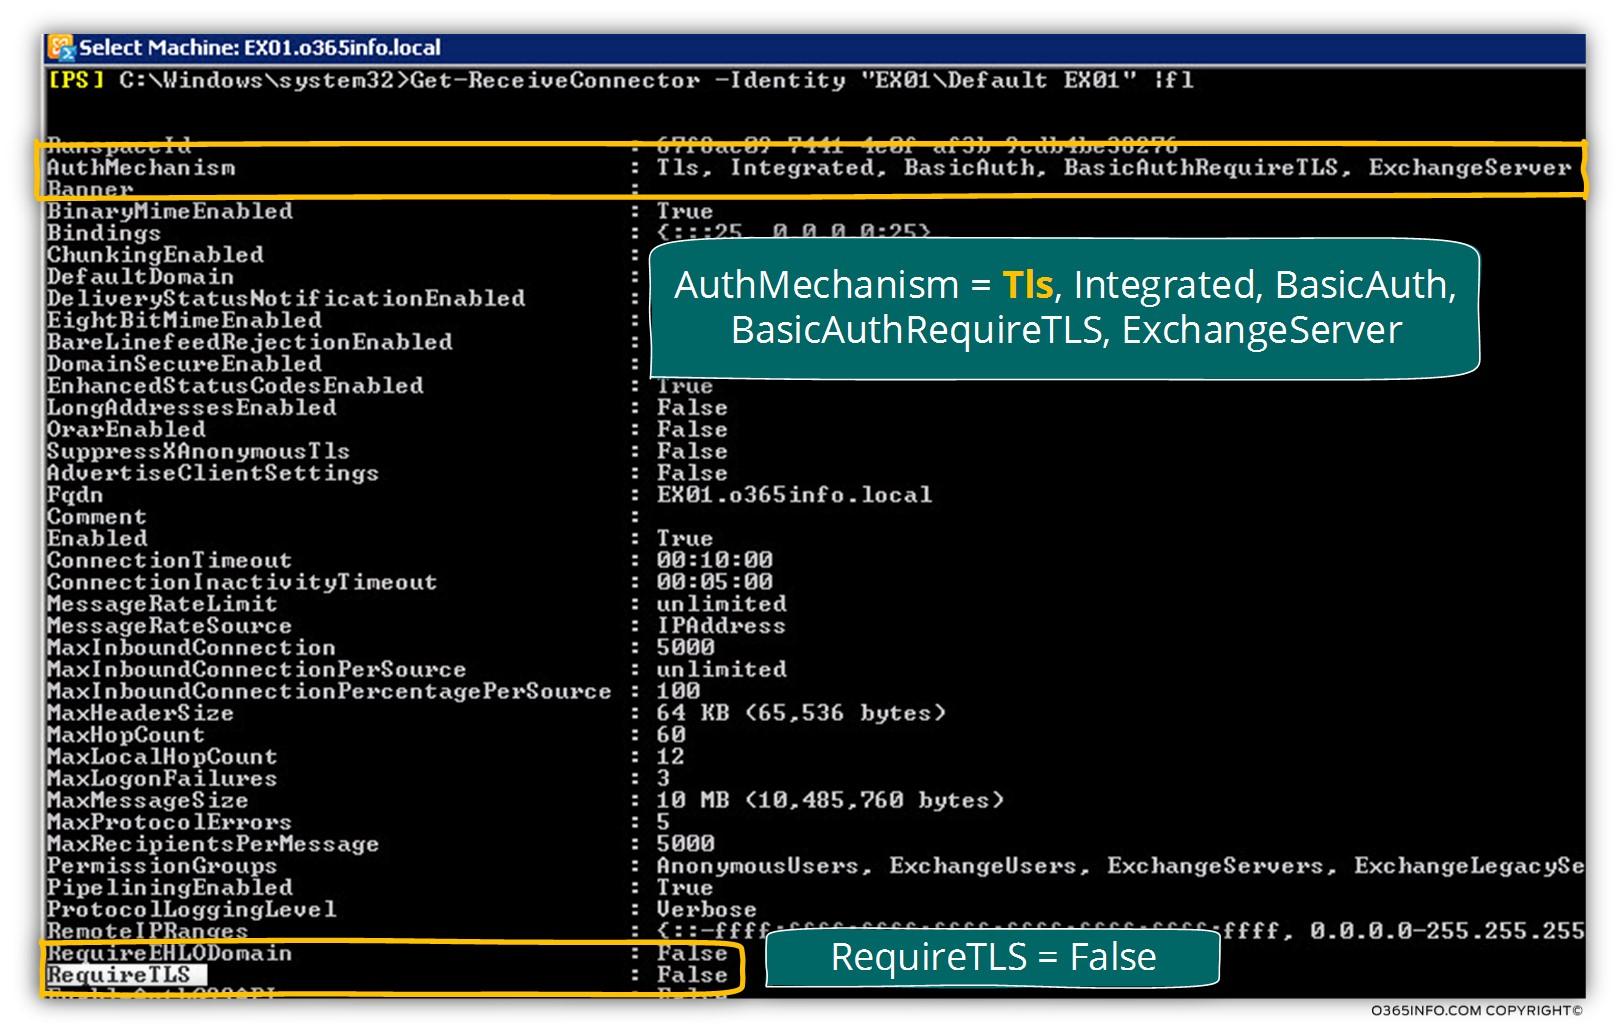 Exchange on-Premises server - Receive connector - opportunistic TLS